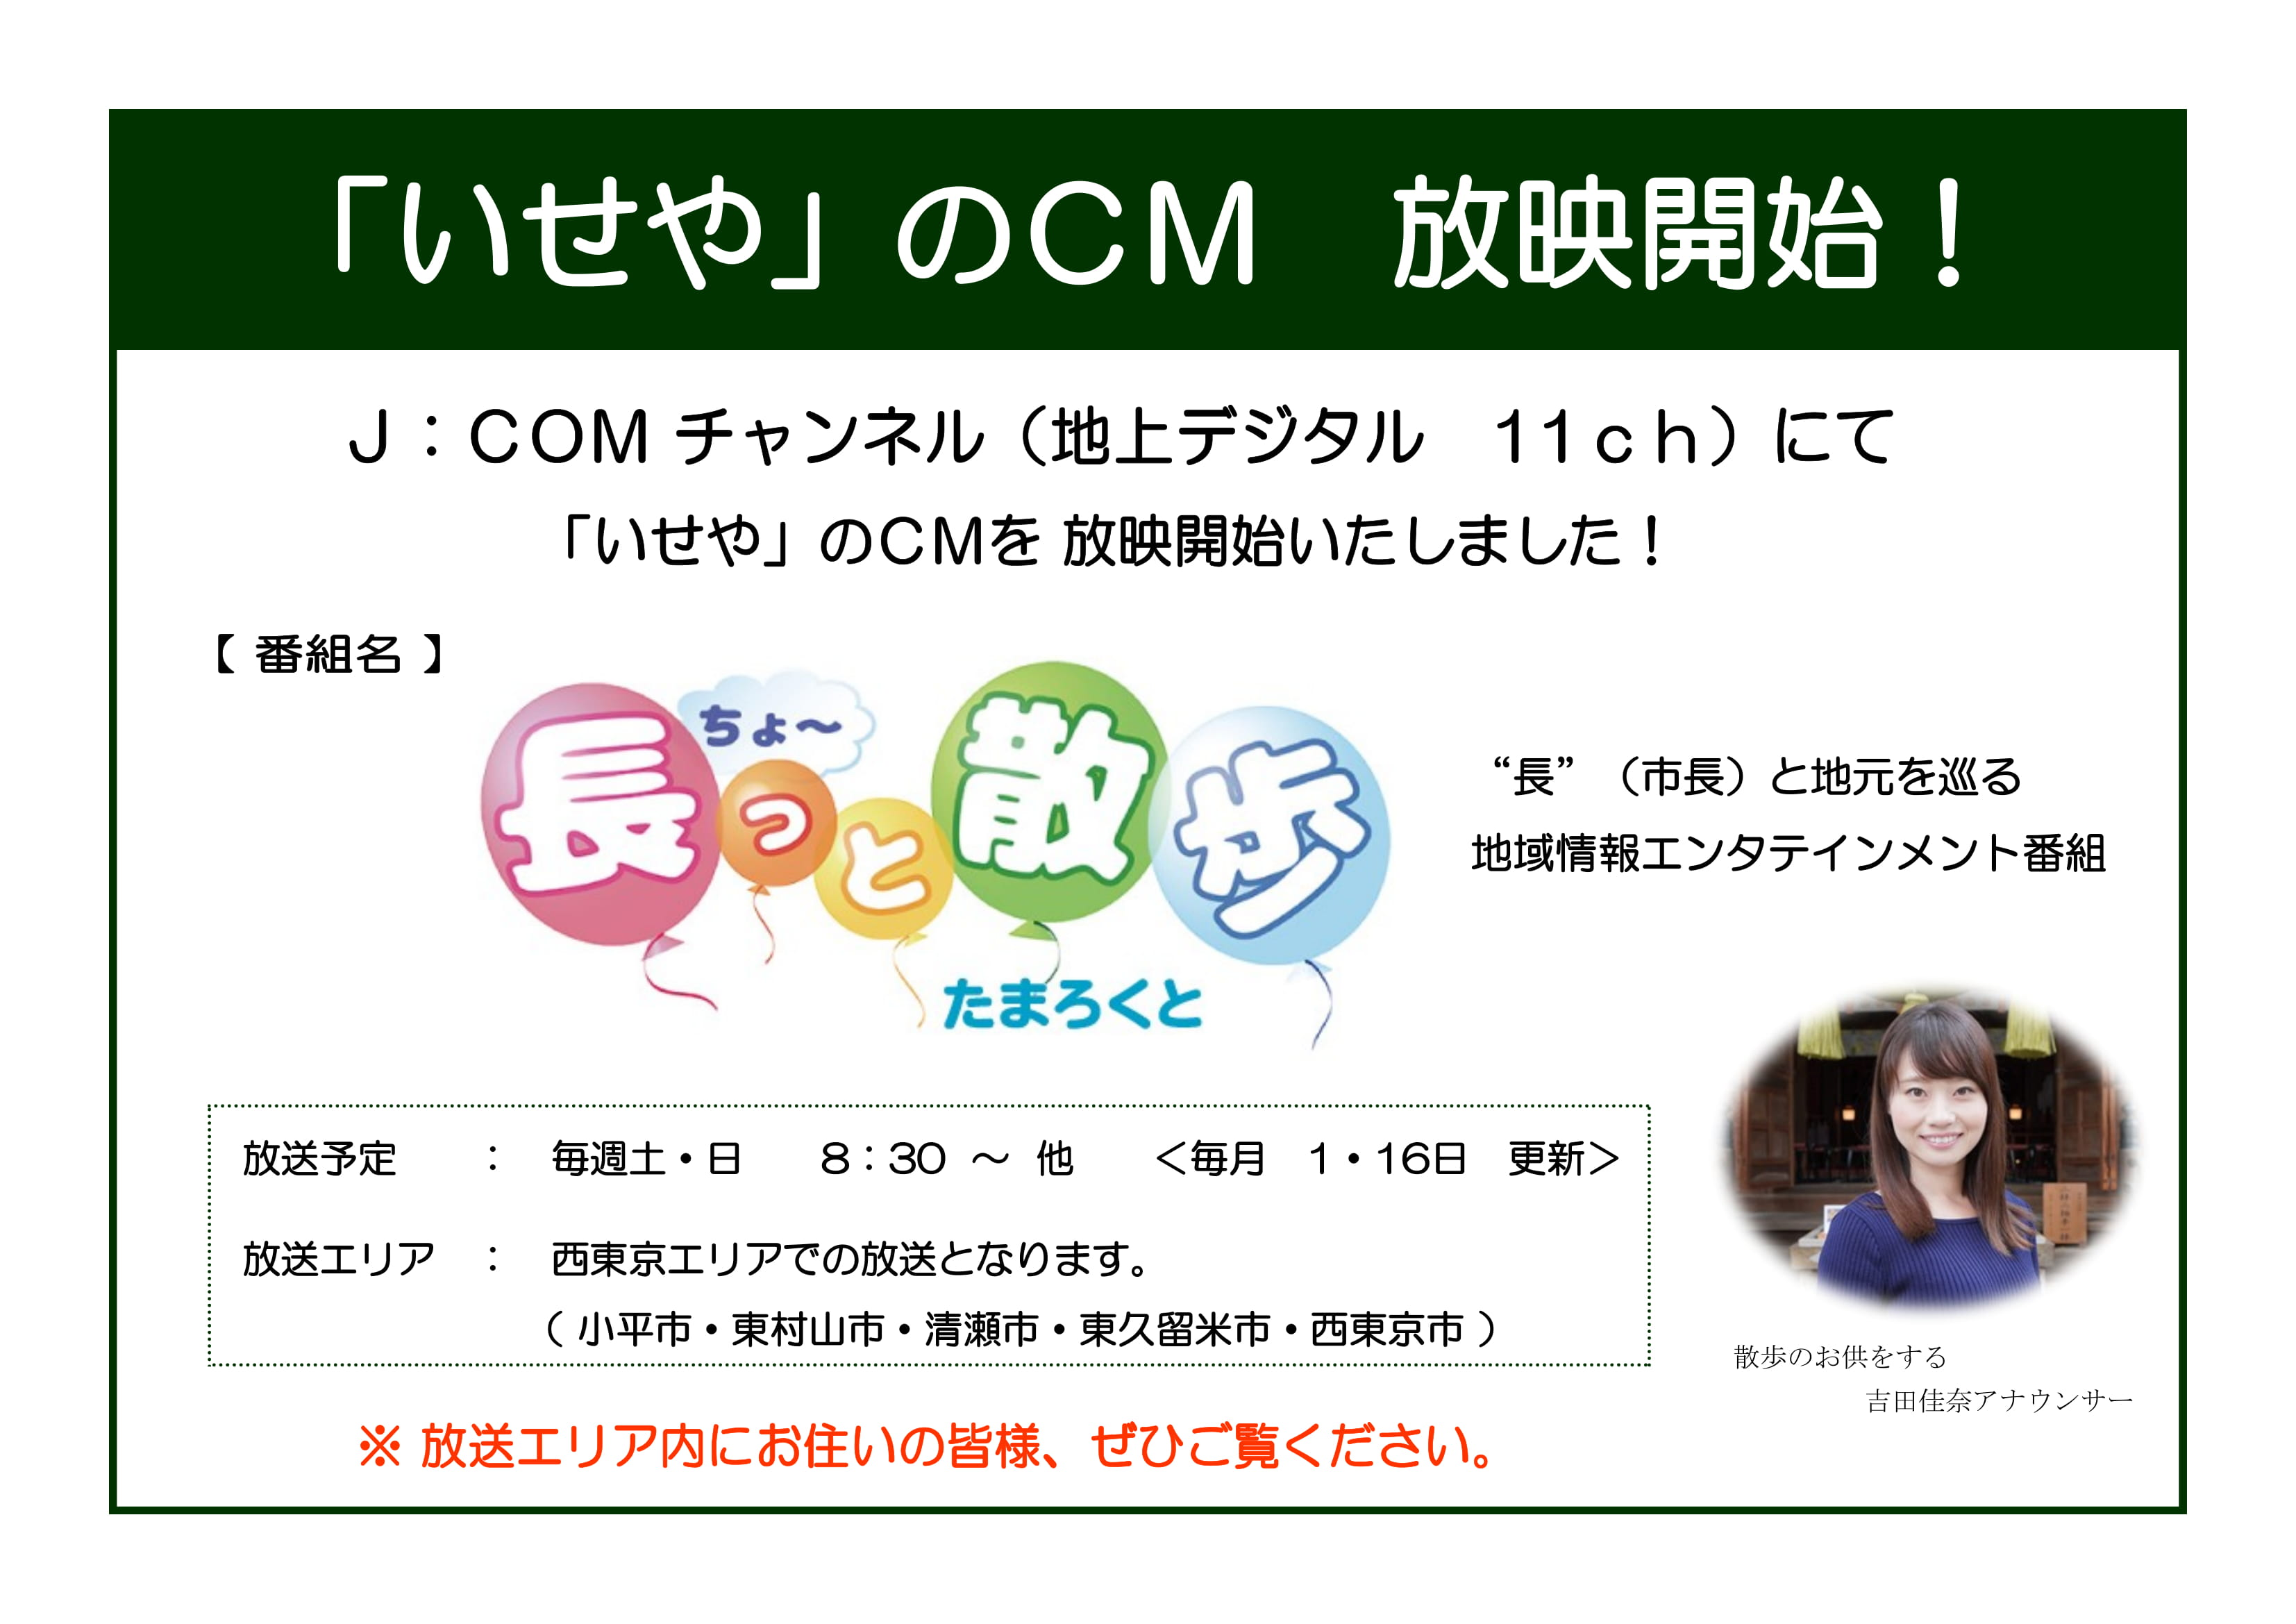 J:COMチャンネル『長っと散歩 たまろくと』にて、いせやのテレビCM放送中!